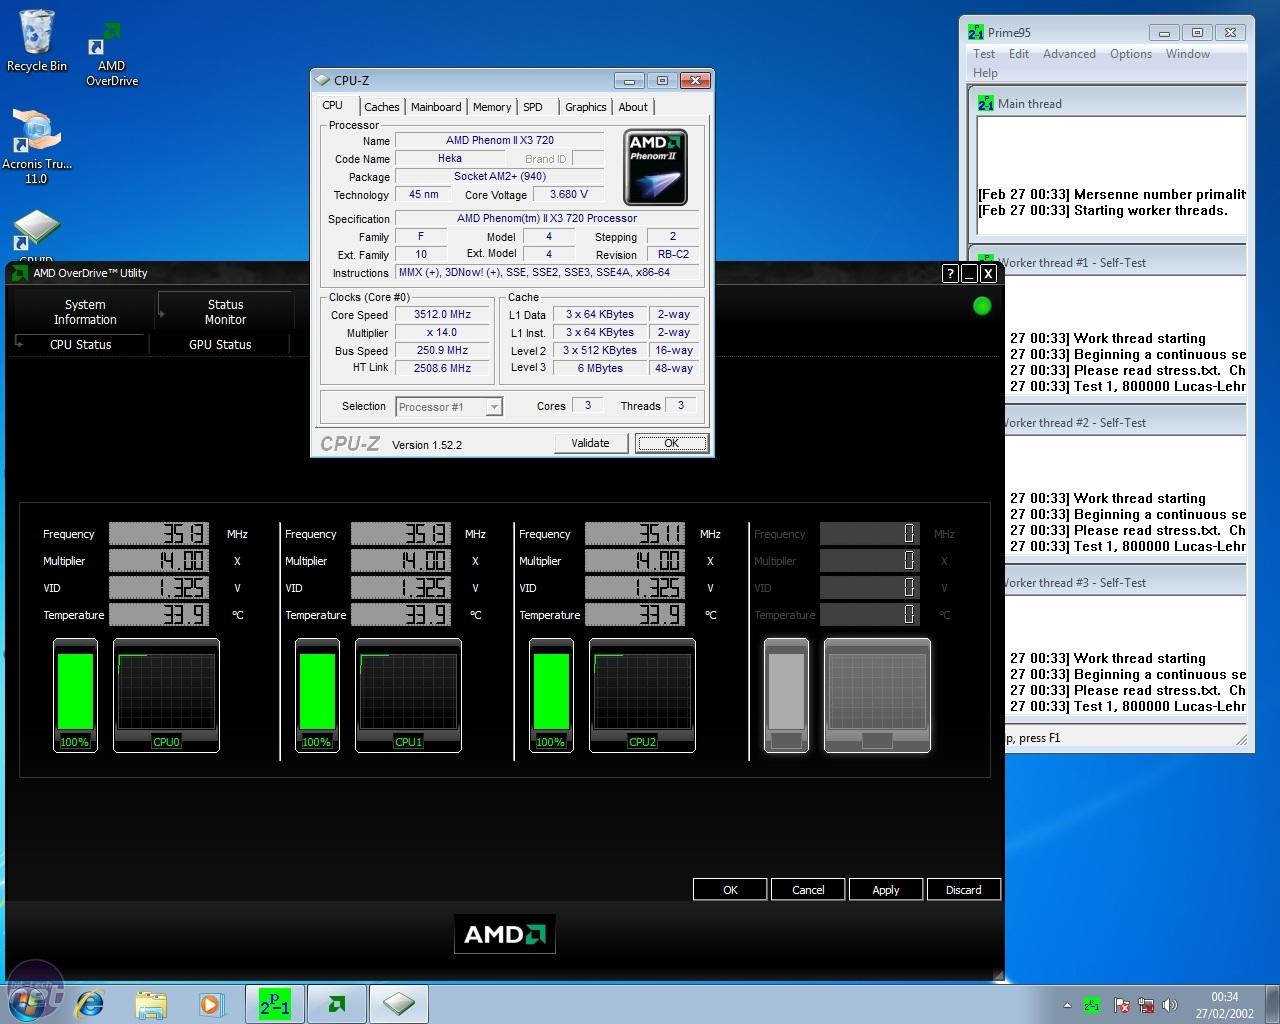 Asus Crosshair IV Formula Motherboard Review | bit-tech net